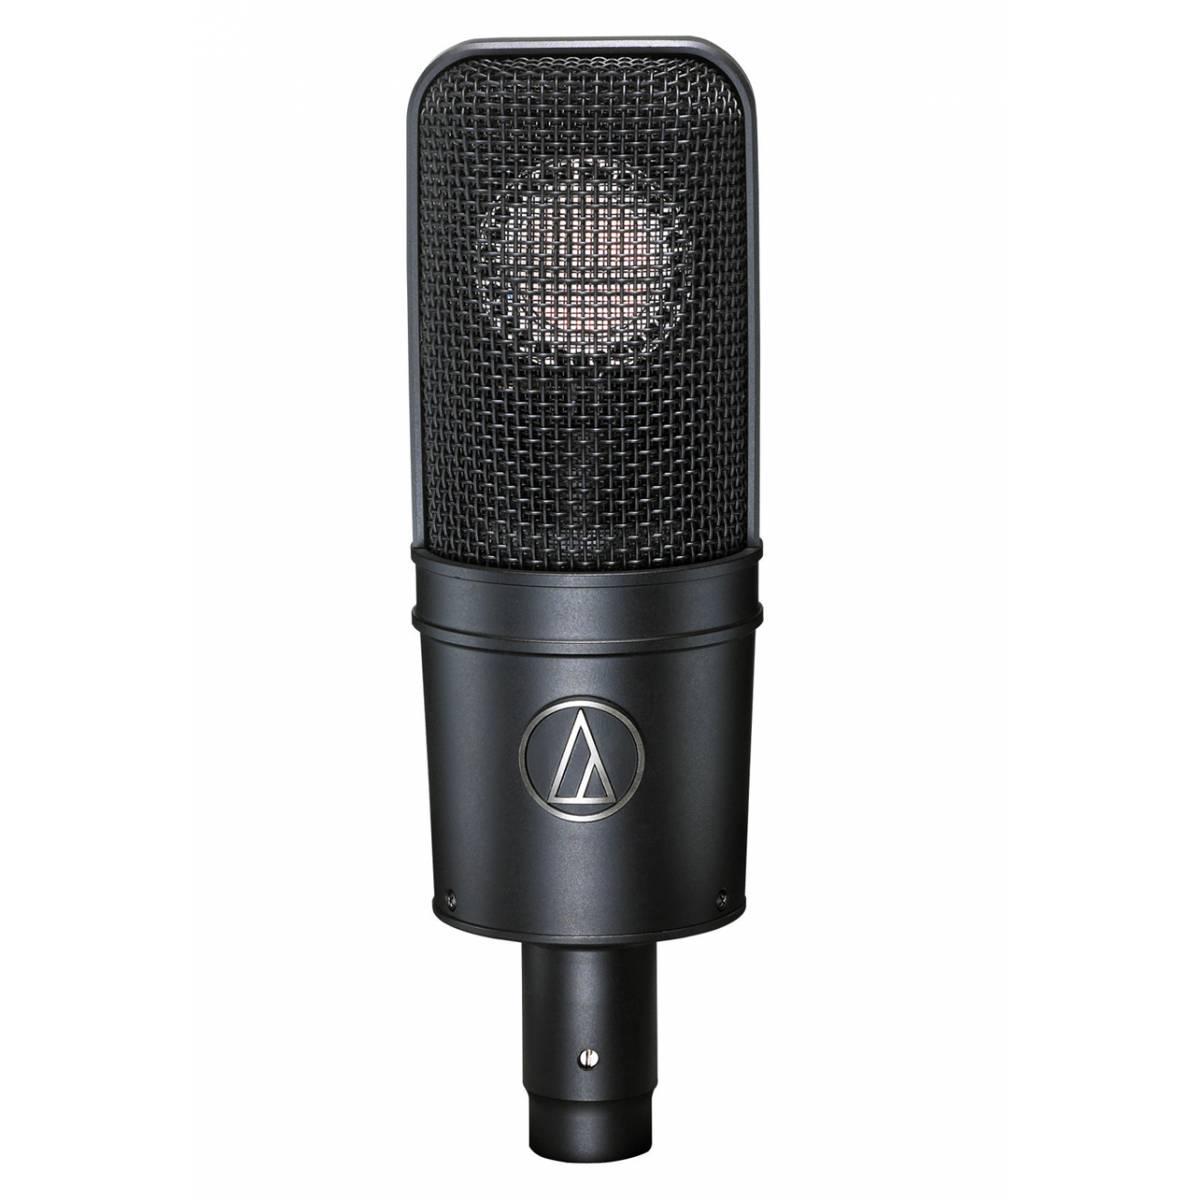 audio technica at4040sm condenser microphones from inta audio uk. Black Bedroom Furniture Sets. Home Design Ideas